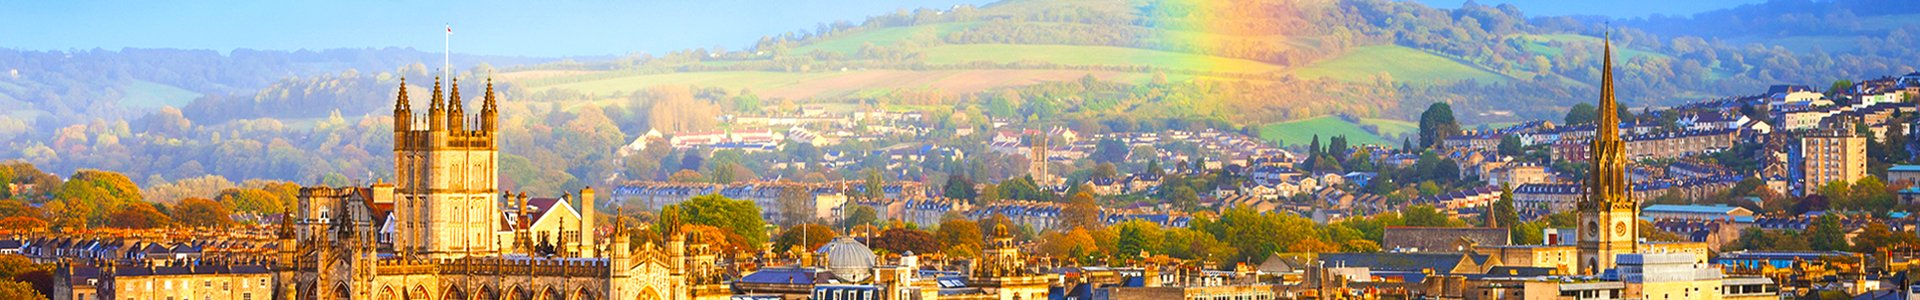 Bath, Groot-Brittannië